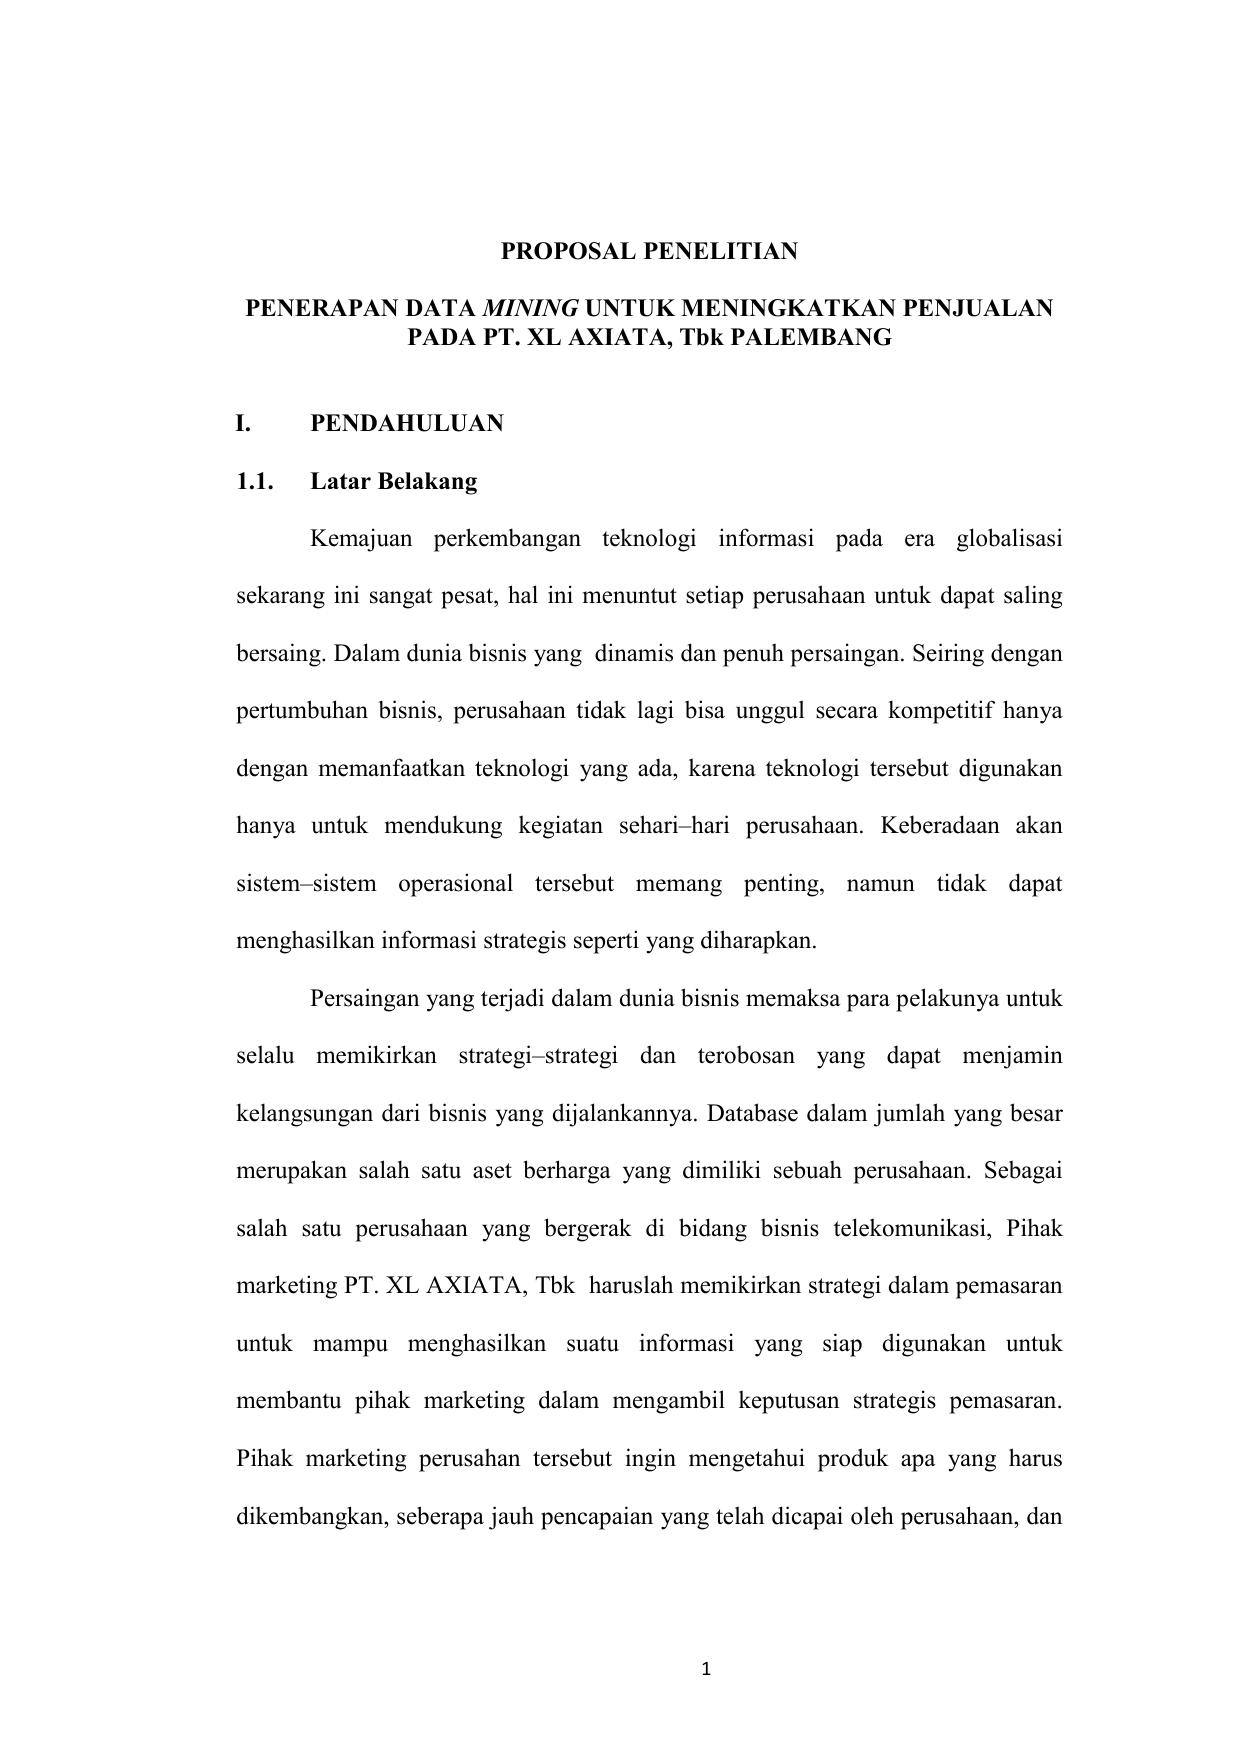 Proposal Penelitian Penerapan Data Mining Untuk